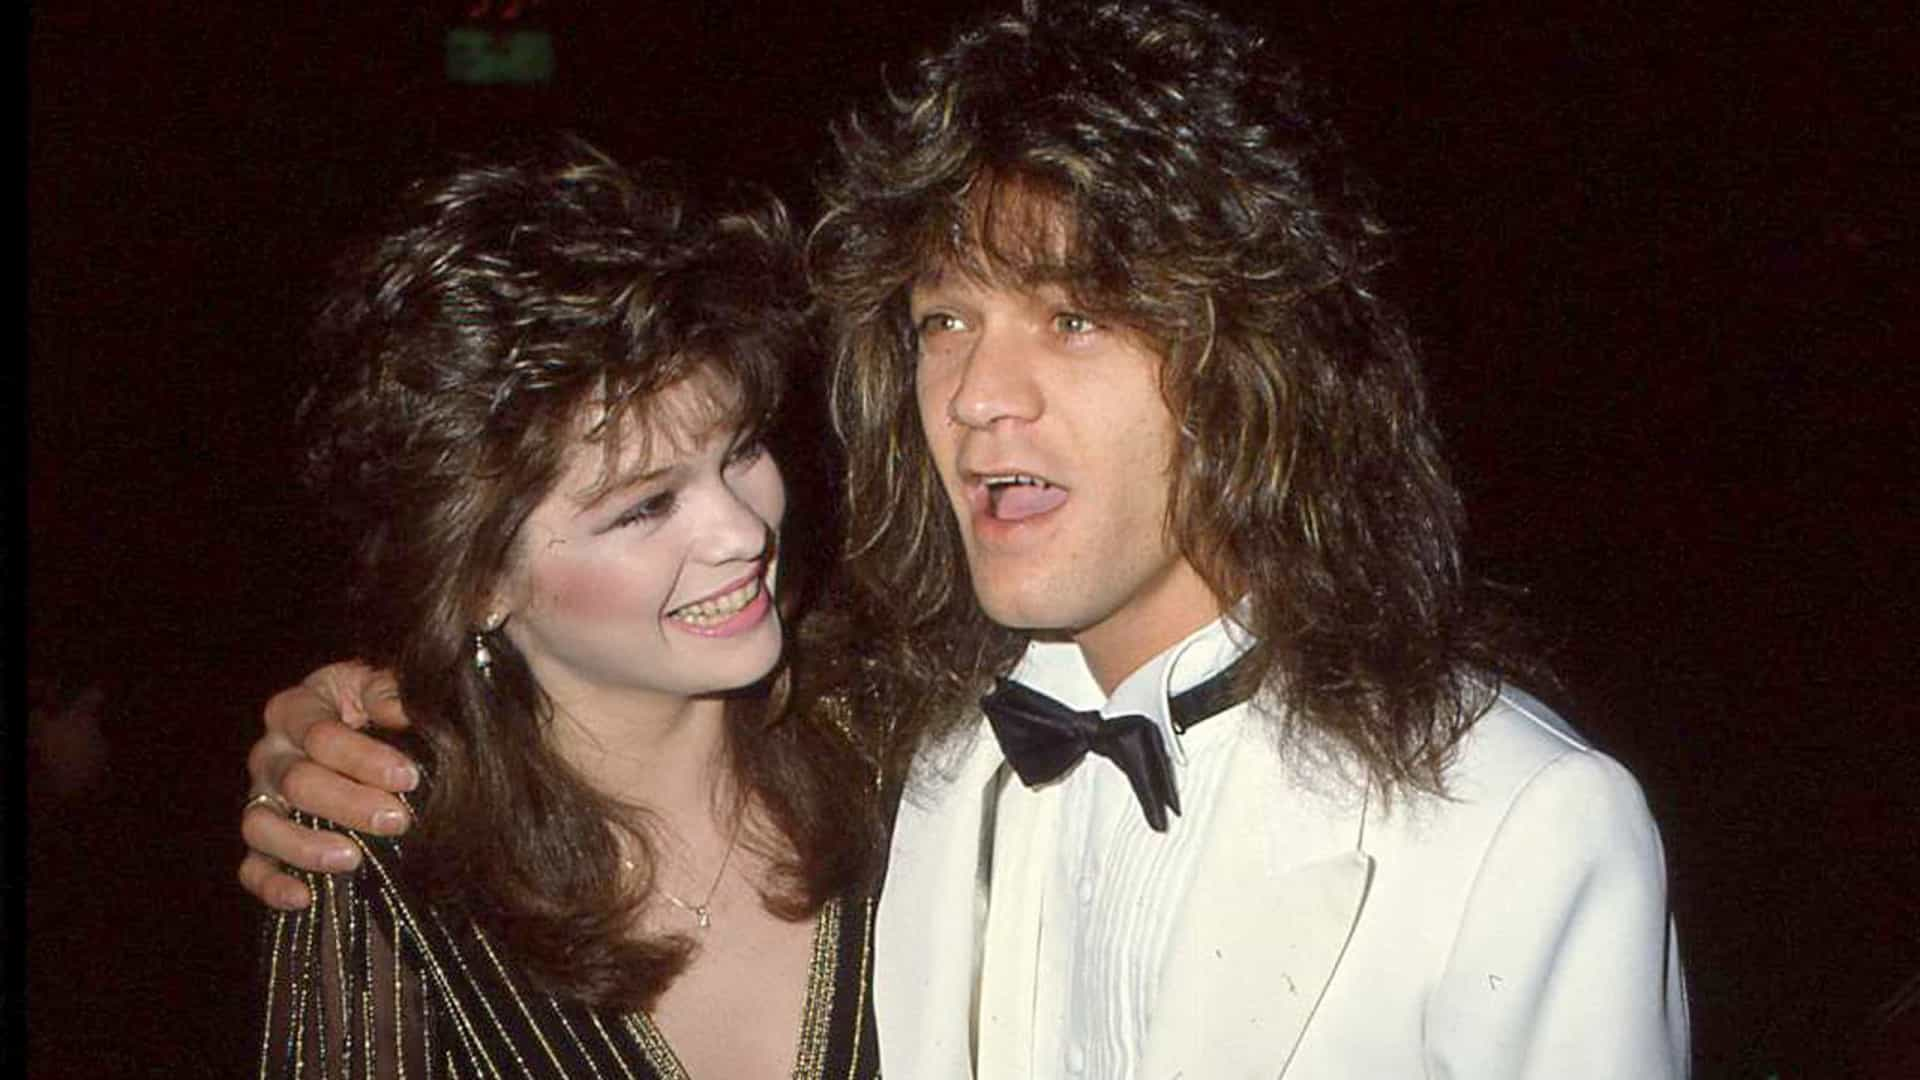 Ex-mulher de Van Halen, Valerie Bertinelli, recorda fotos 'únicas'